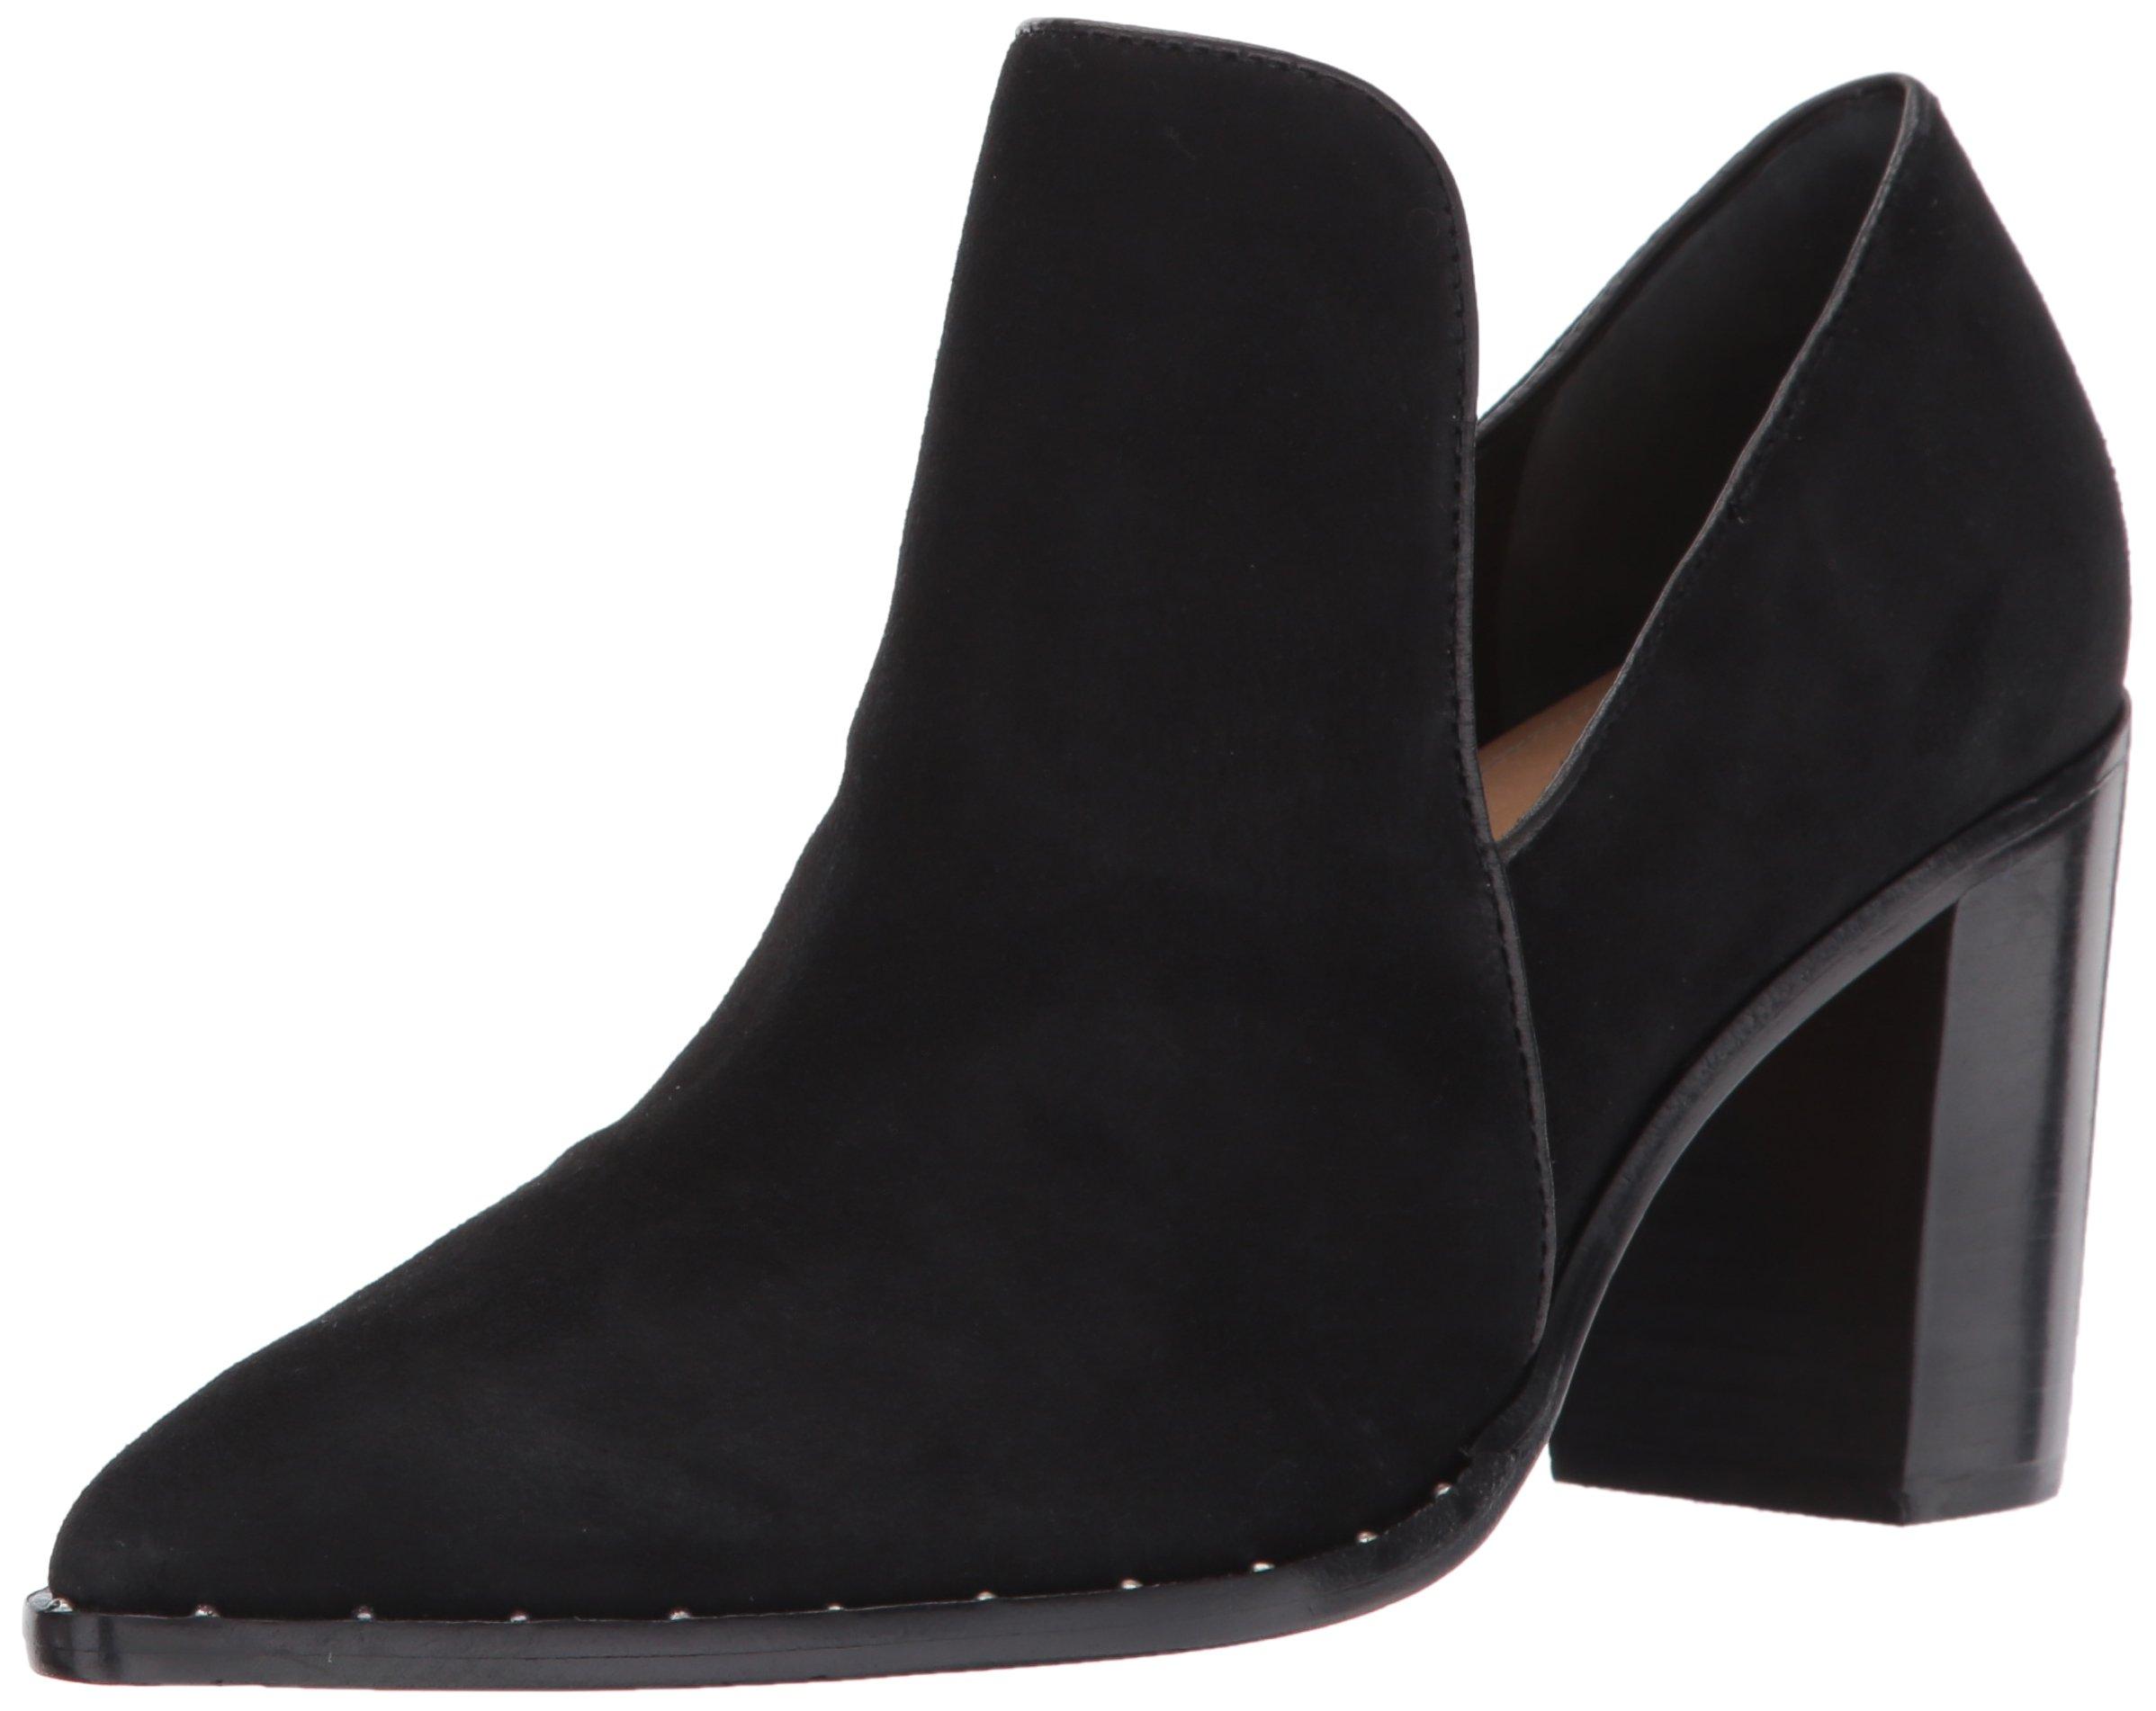 SCHUTZ Women's FOMO Ankle Boot, Black 143, 9.5 M US